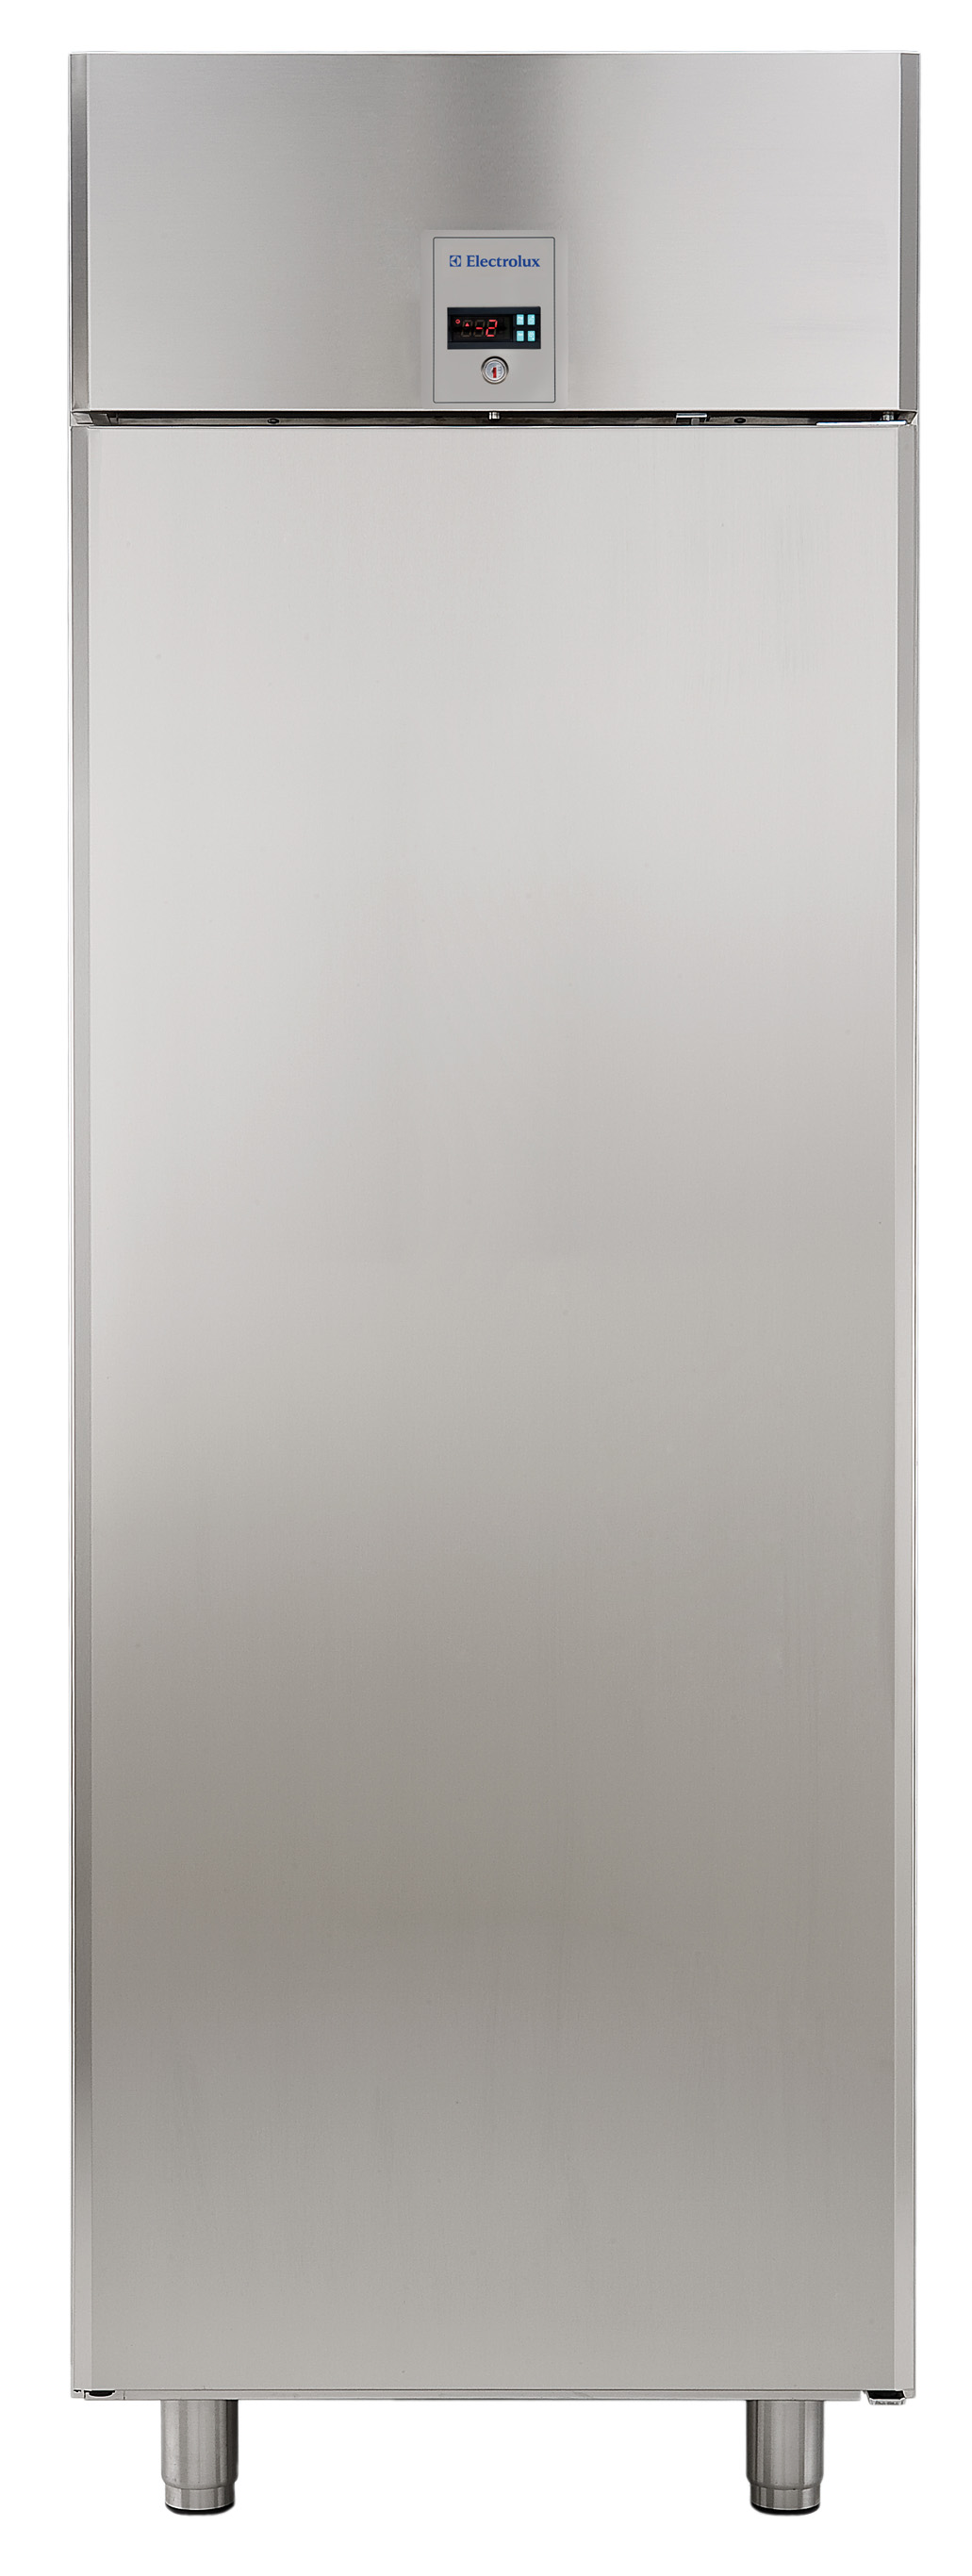 Electrolux Rex71fr 1 Door Refrig 670l 2 10 176 C Digital Cl